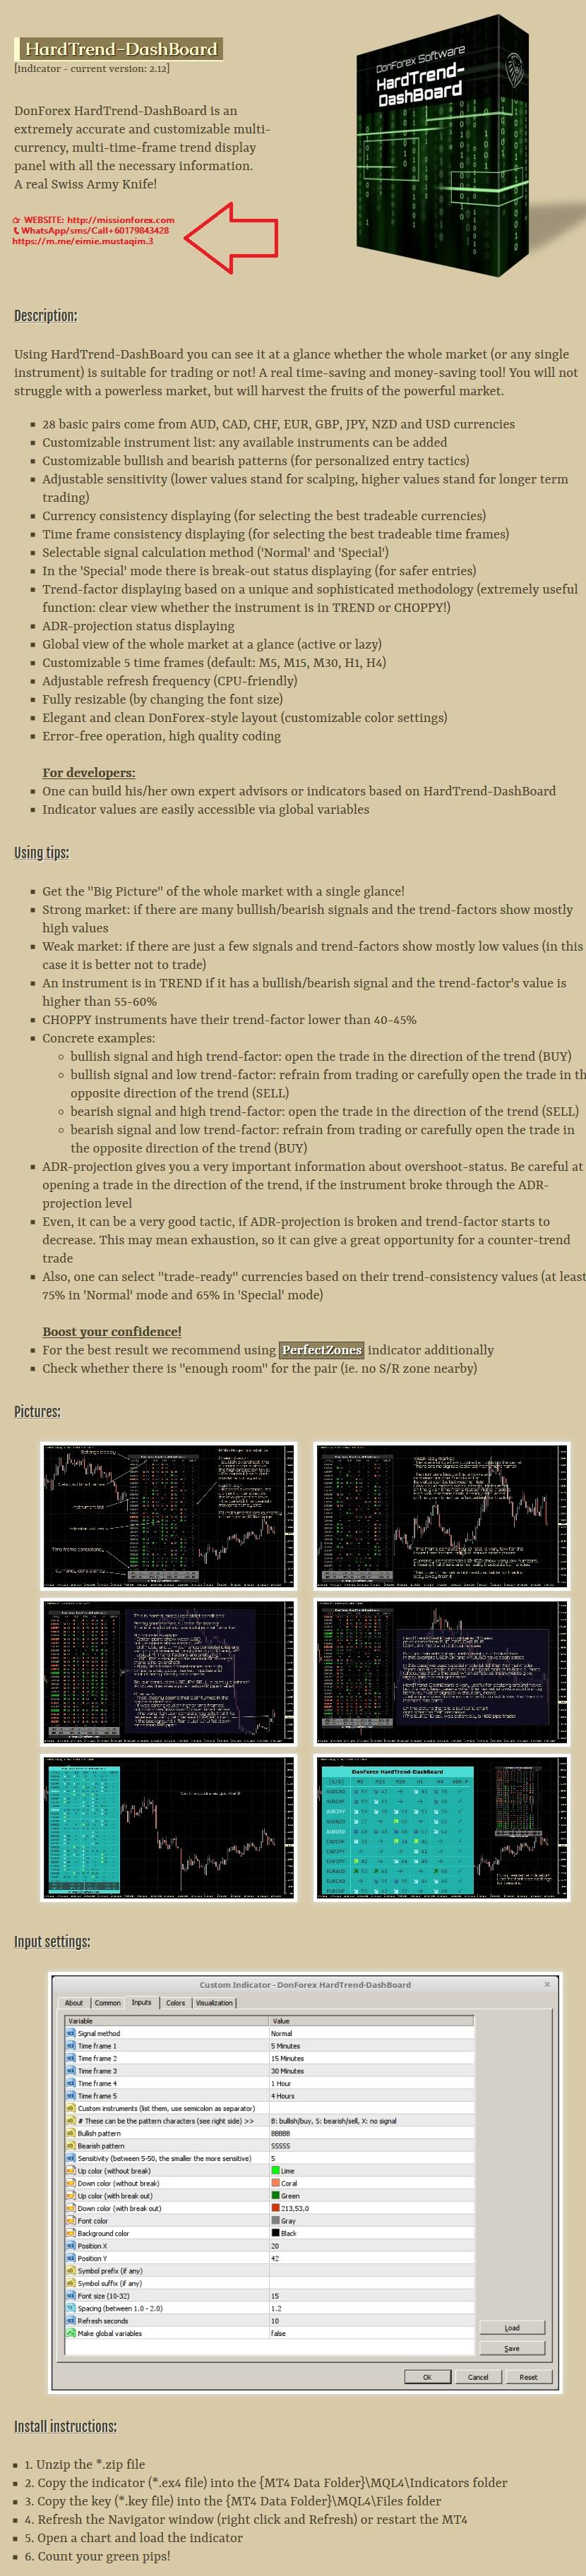 DonForex HardTrend-DashBoard working (Enjoy Free BONUS CTI Trading Indicator)